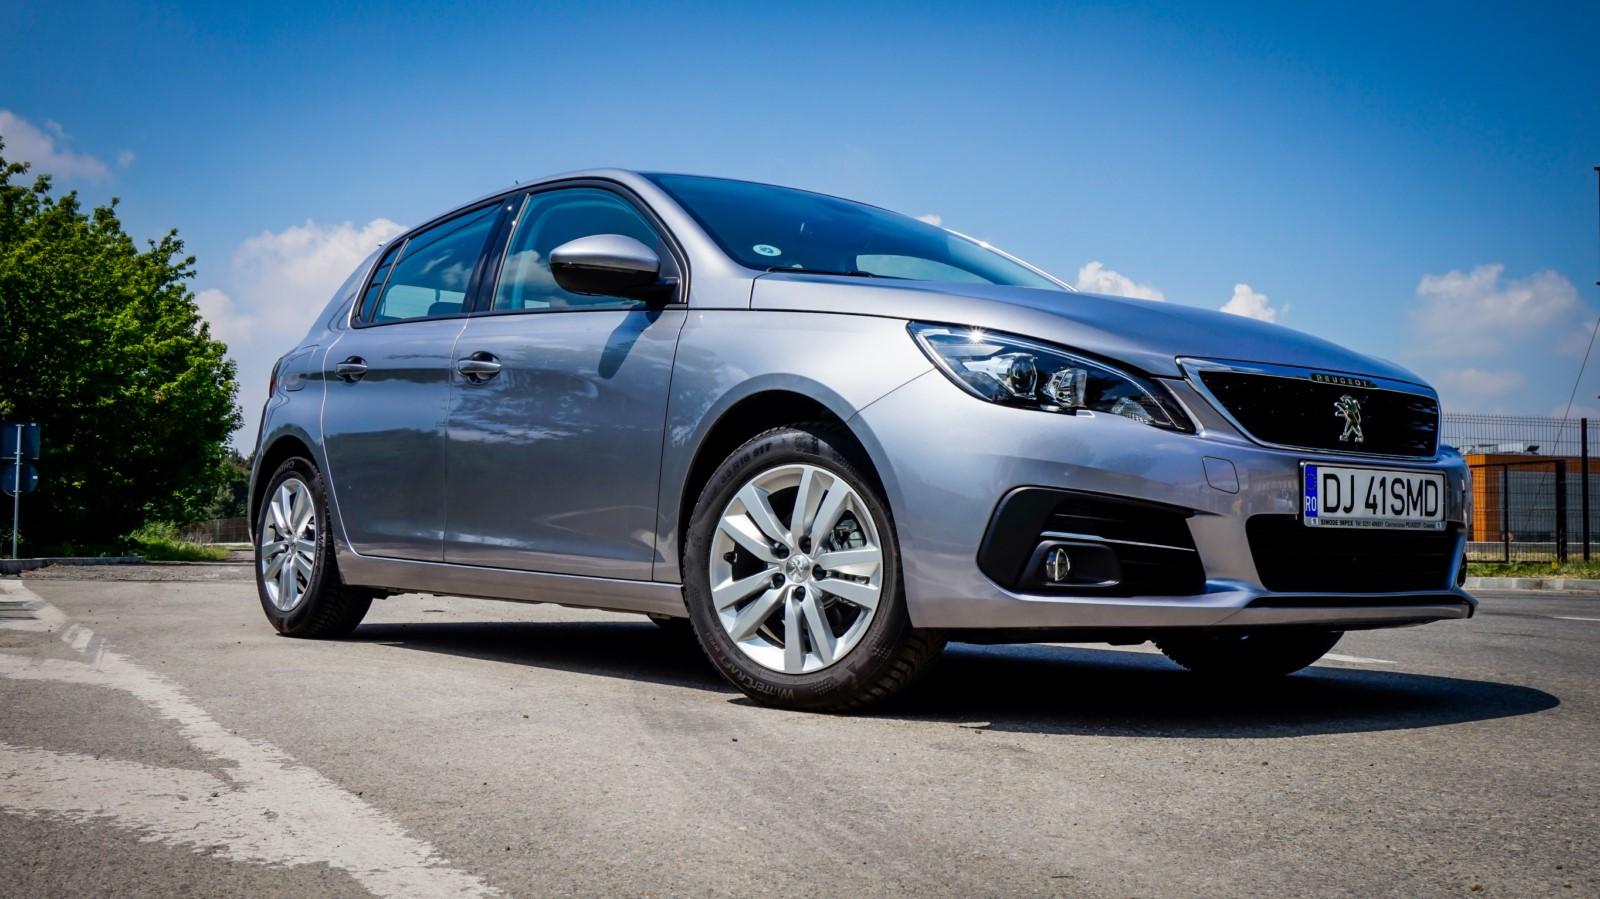 Peugeot 308 - Simode Car Rentals